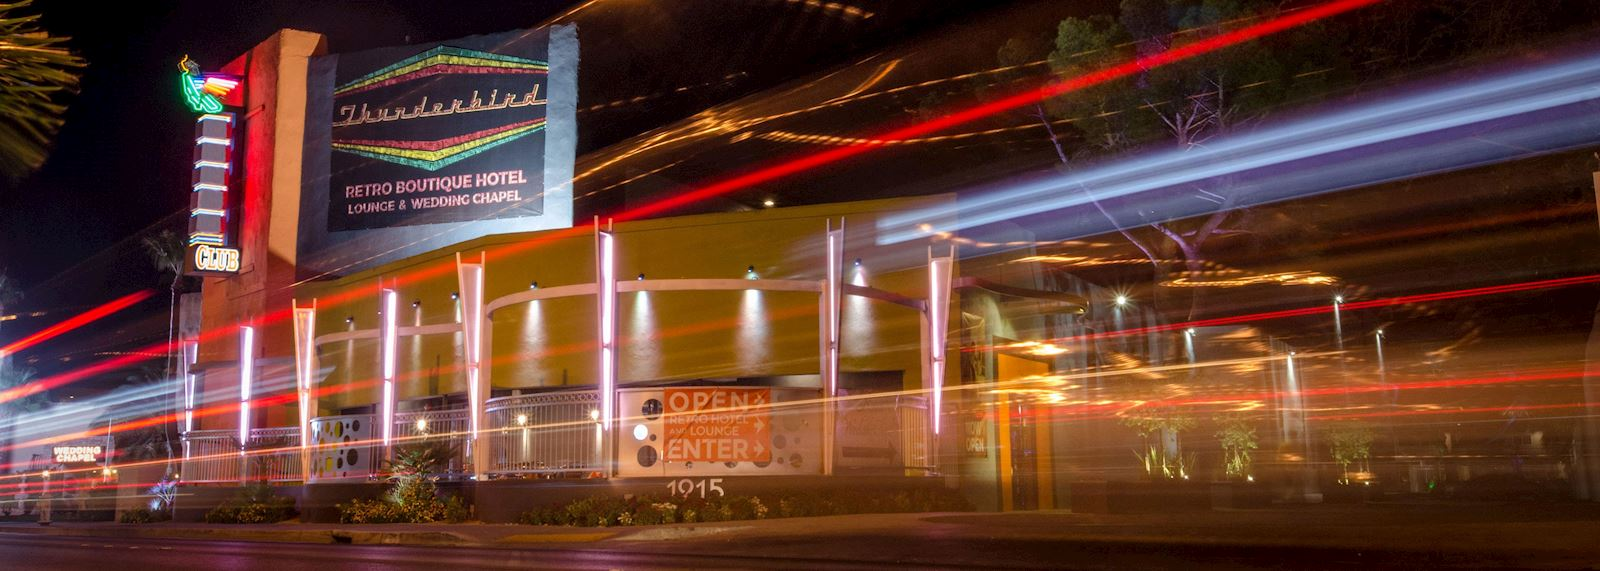 Thunderbird Boutique Hotel, Las Vegas, Nevada